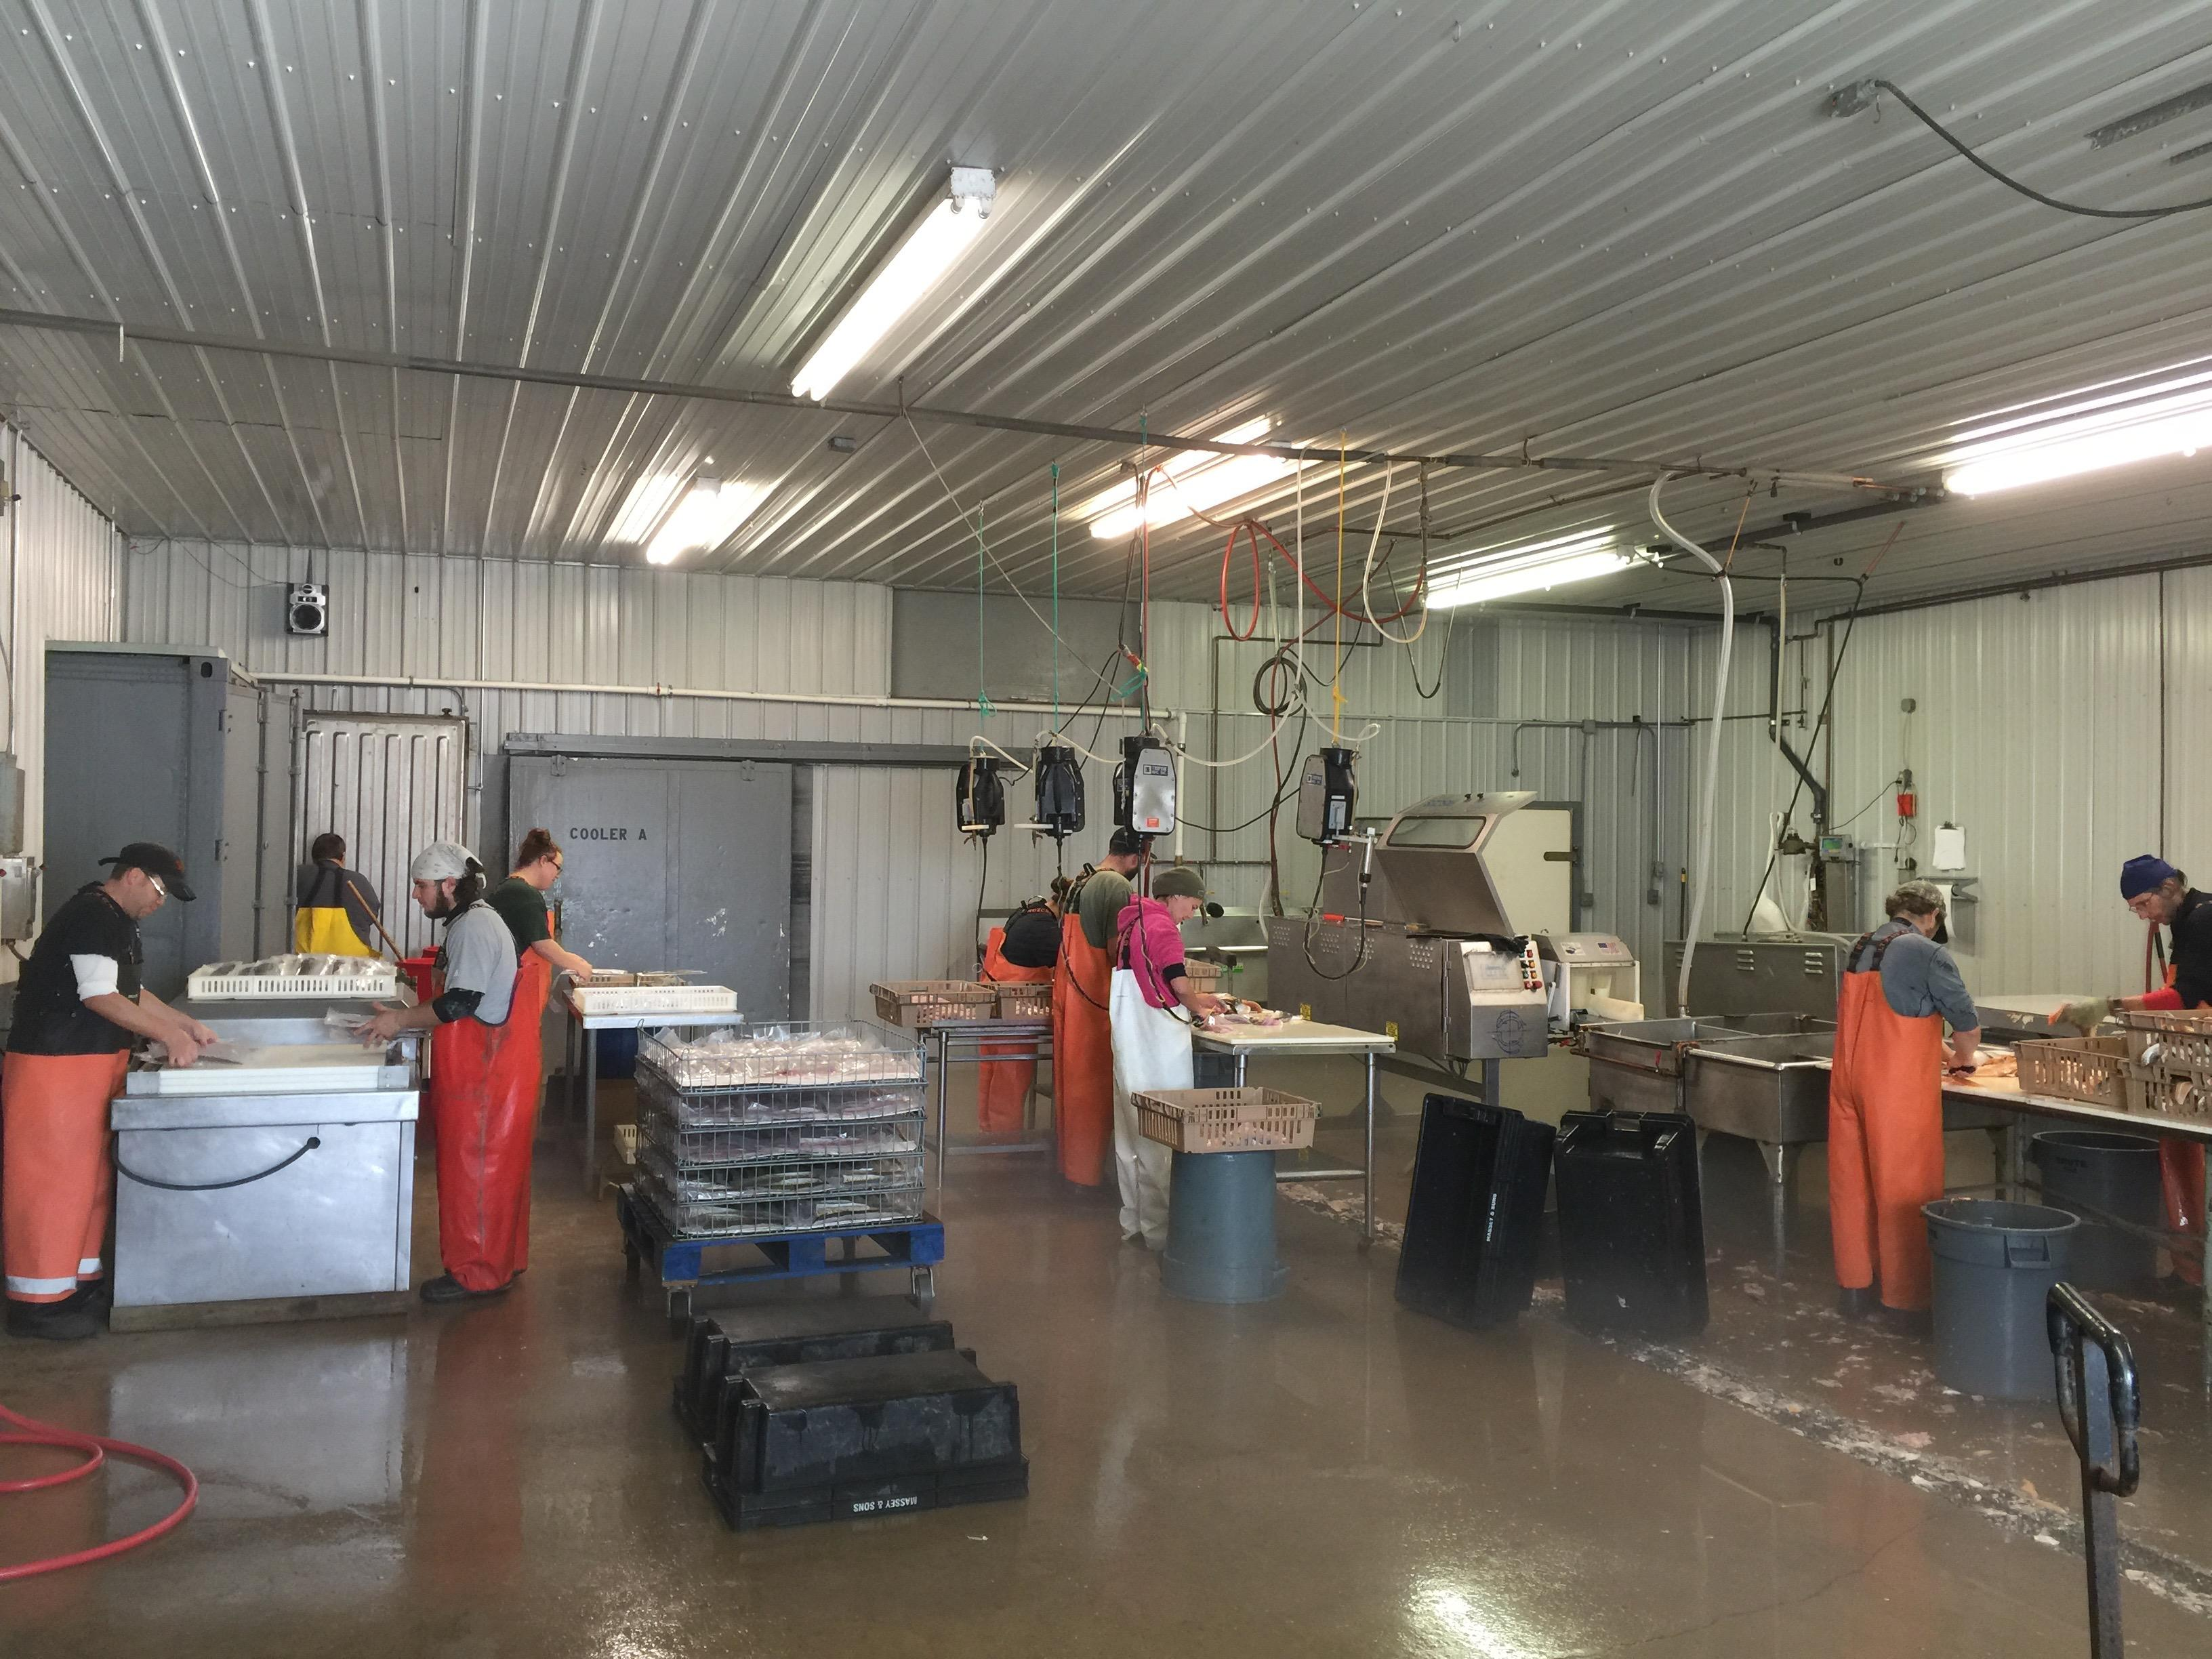 Massey Fish Co. image 13